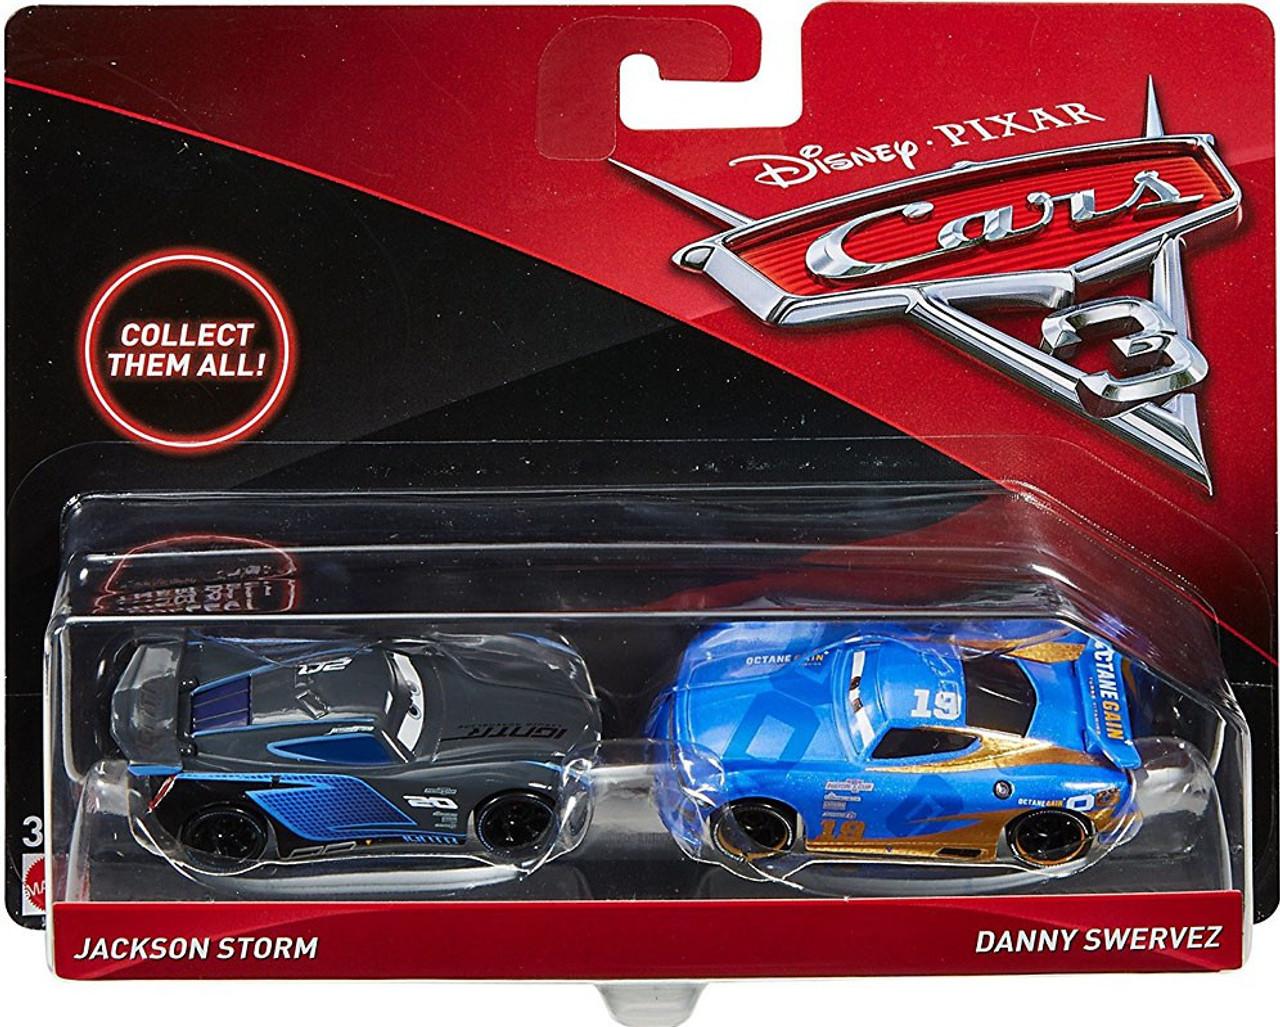 Disney Pixar Cars Cars 3 Jackson Storm Danny Swervez Diecast 2 Pack